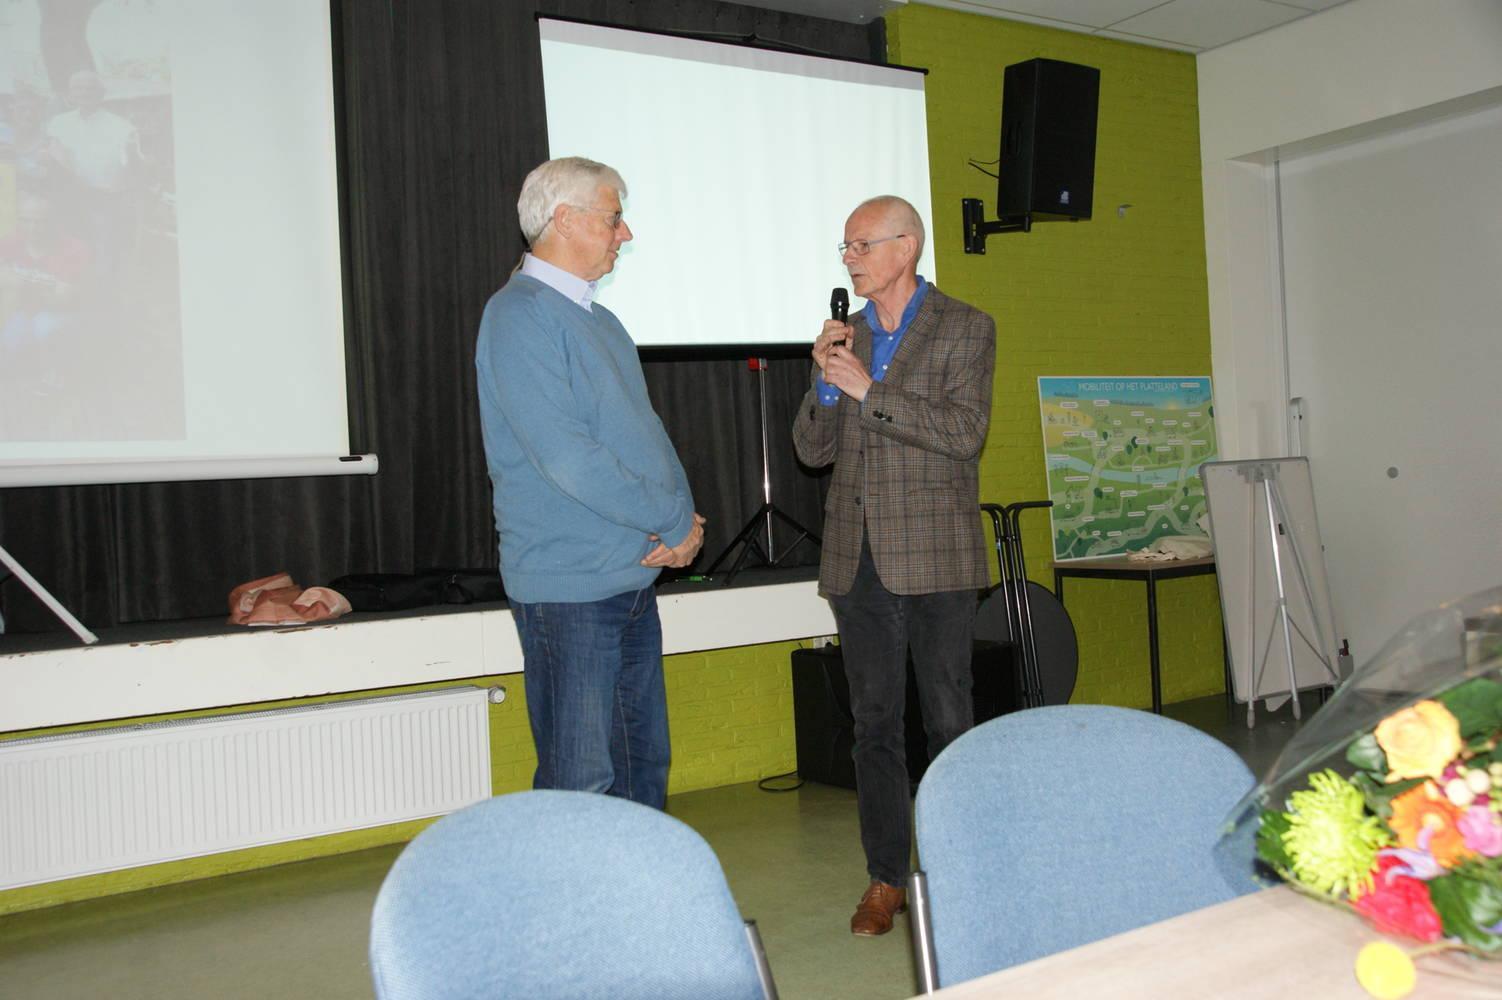 Ger Steenbergen nieuwe voorzitter Dorpenoverleg